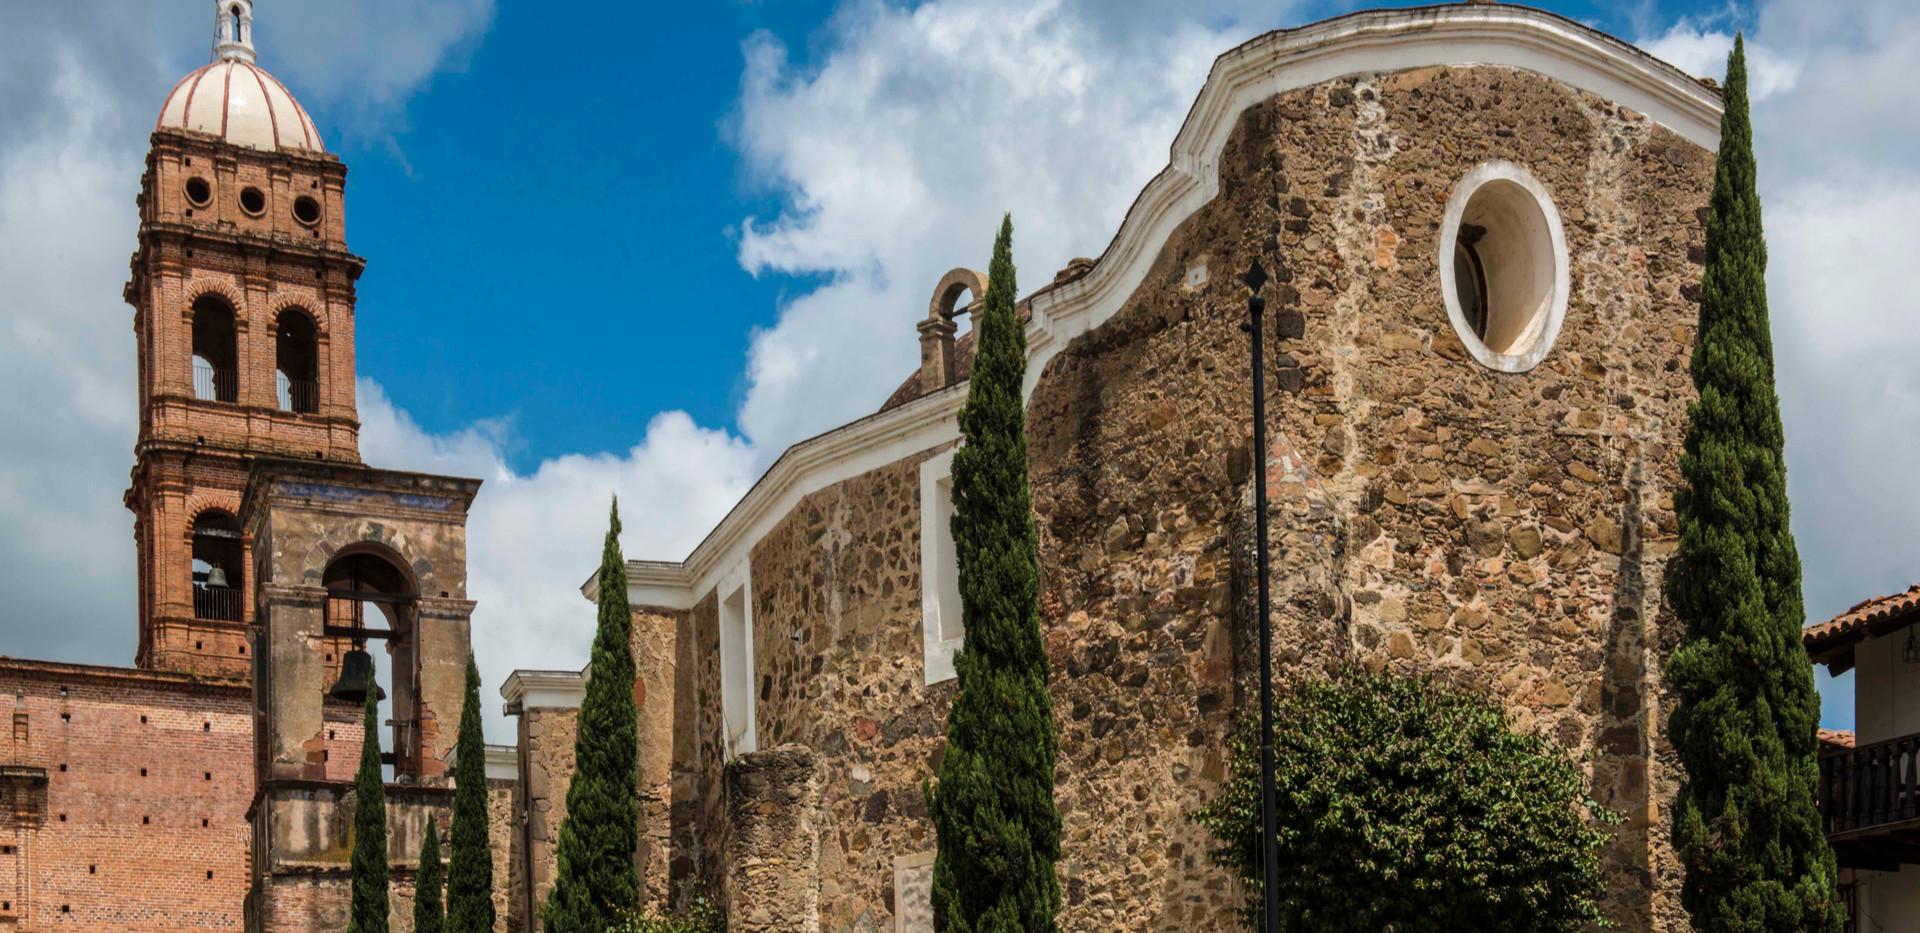 Old Cathedral Talpalpa